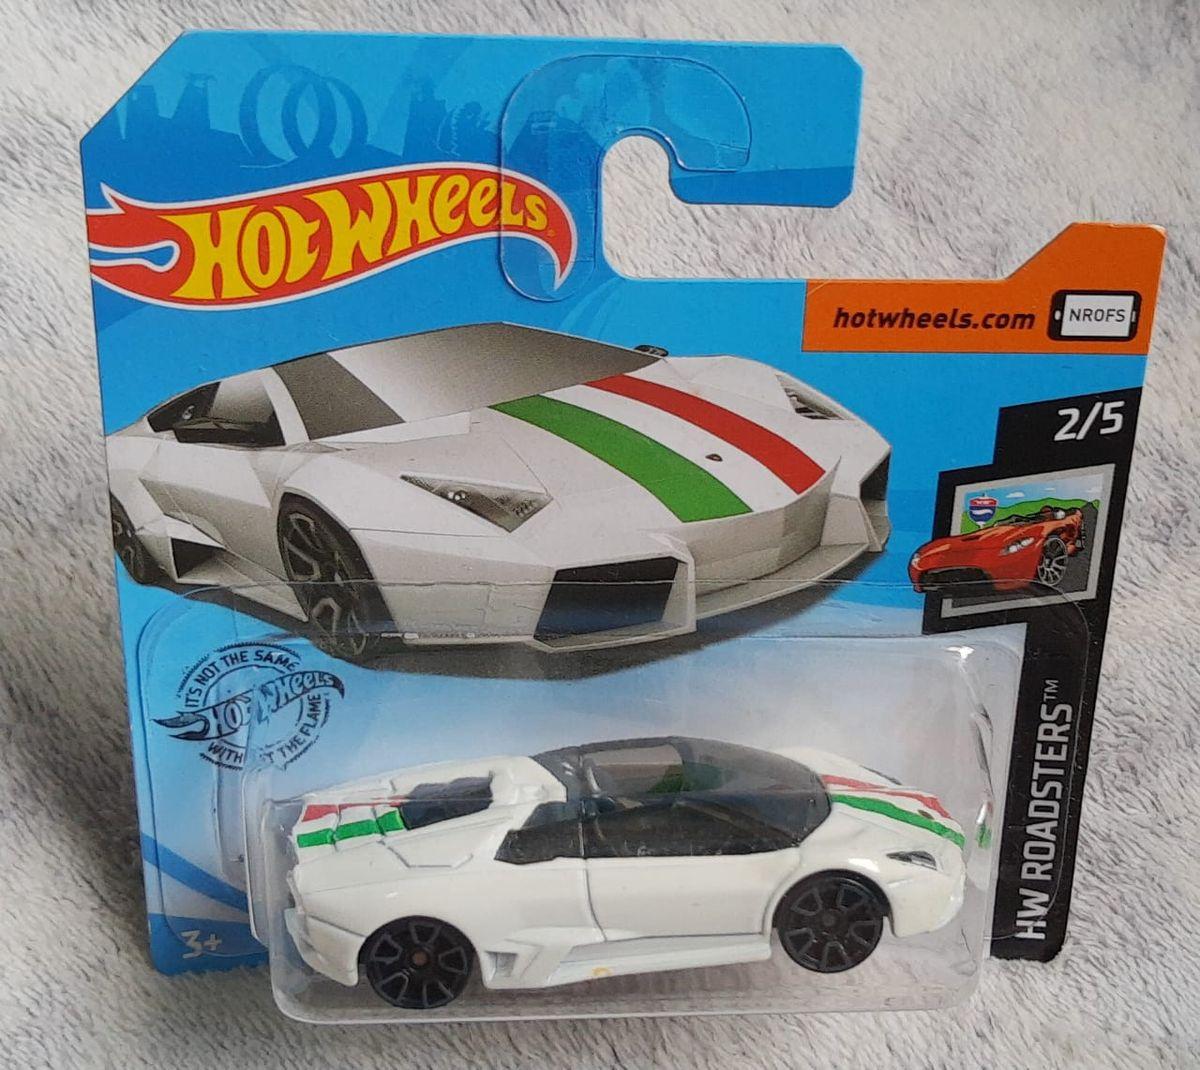 Hot Wheels Hw 2019 Lamborghini Reventon Roadster Carro Mattel Nunca Usado 43512745 Enjoei